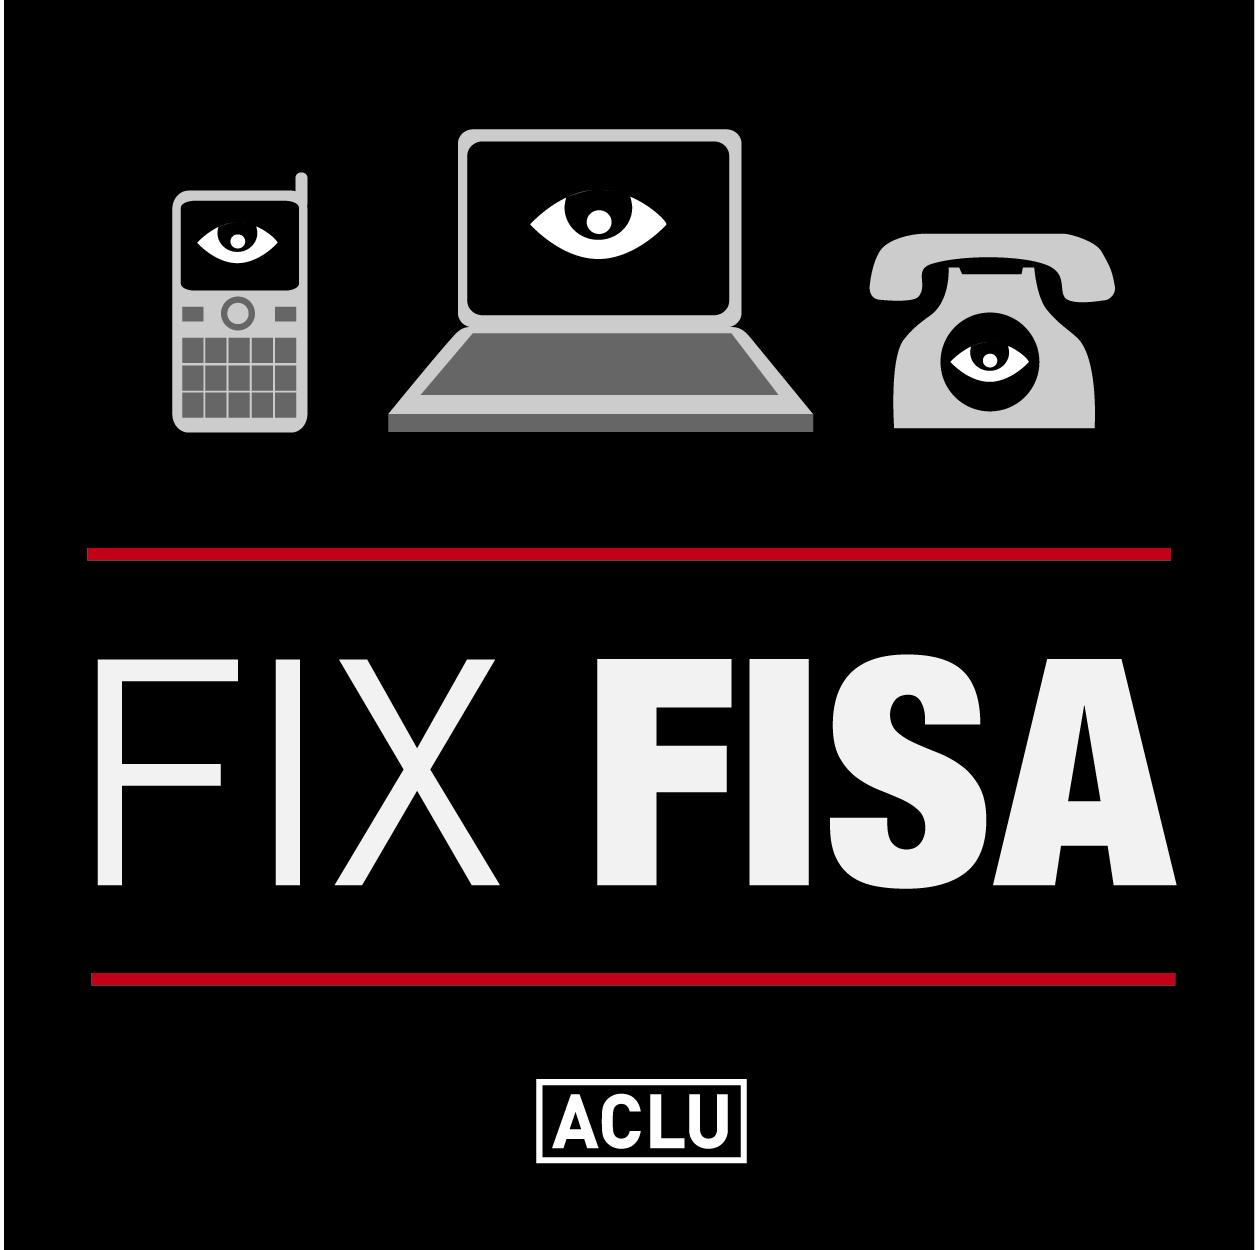 Fix FISA - End Warrantless Wiretapping | American Civil Liberties Union